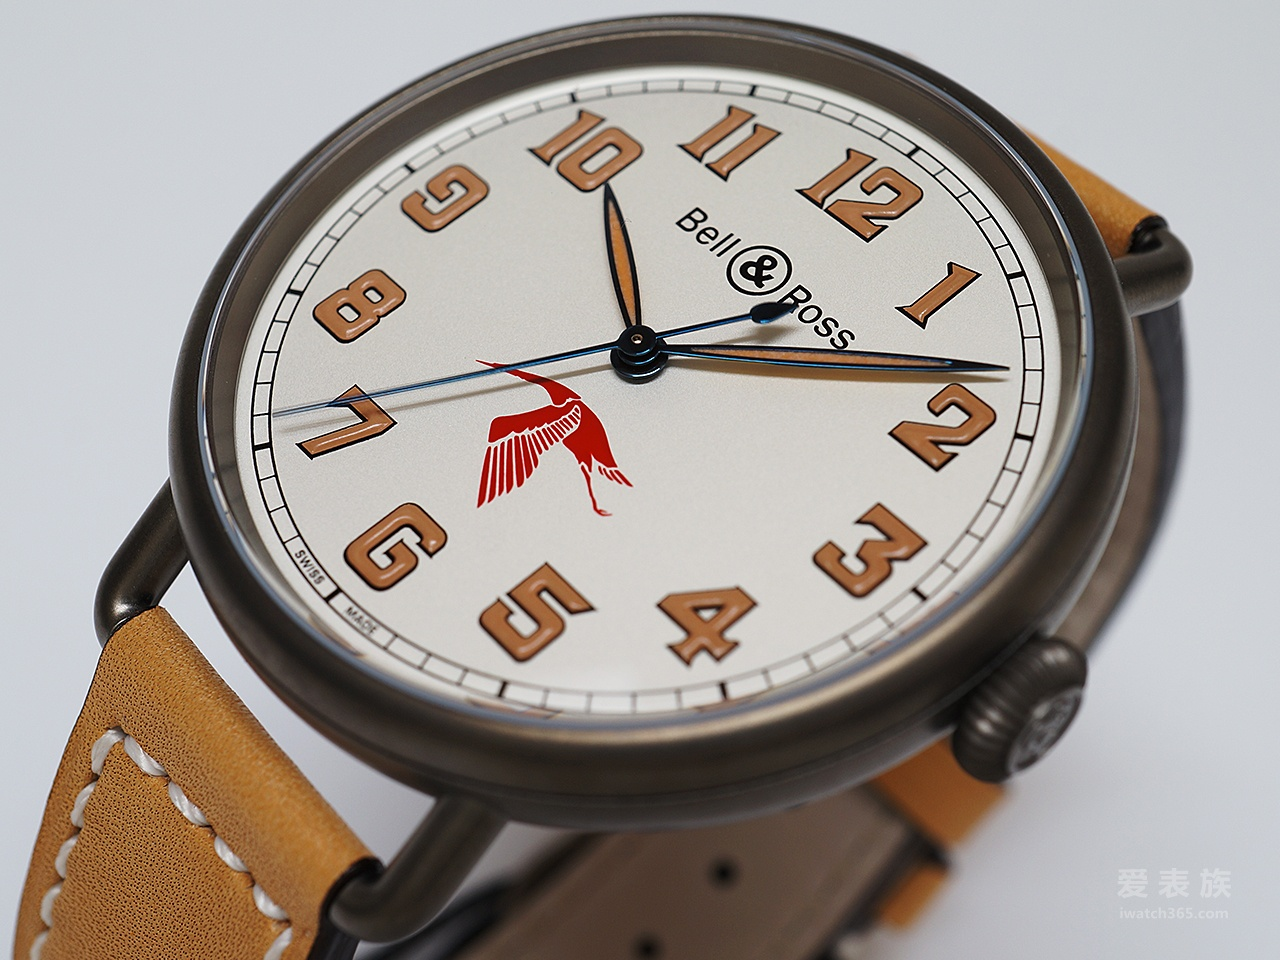 柏莱士VINTAGE系列BRWW192-GUYNEMER男士腕表